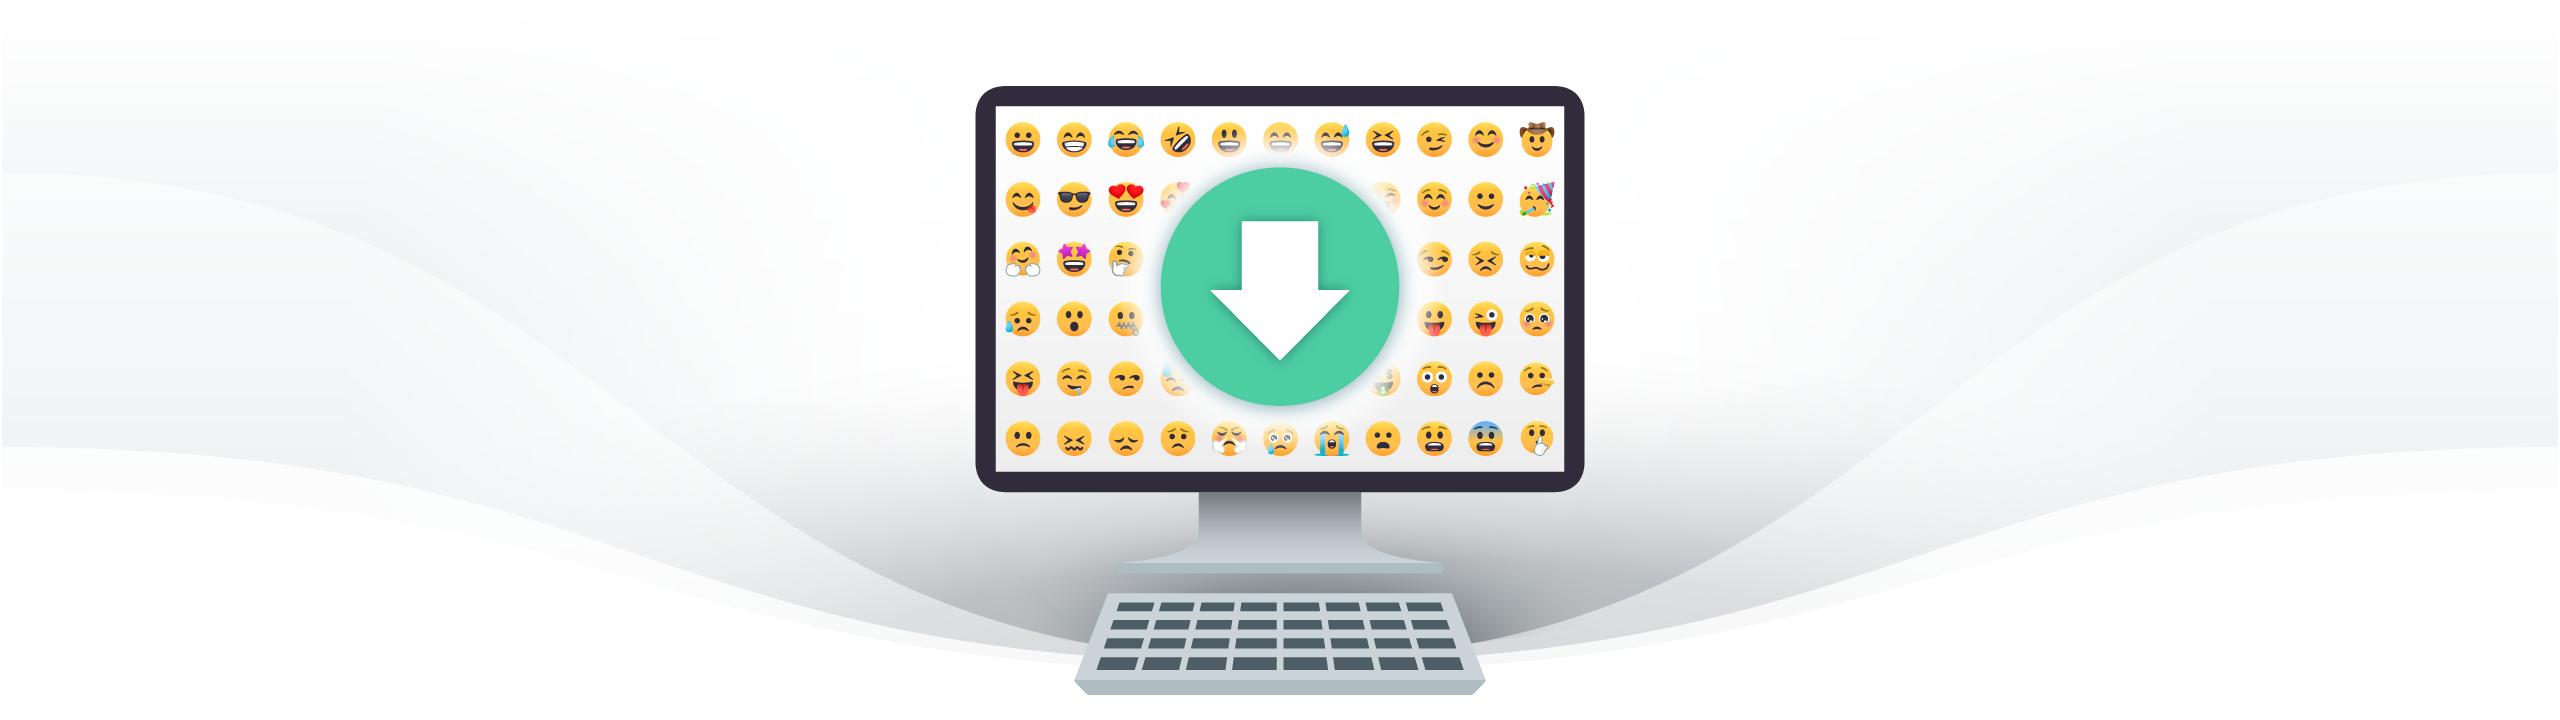 JoyPixels   Emoji Icons Downloads